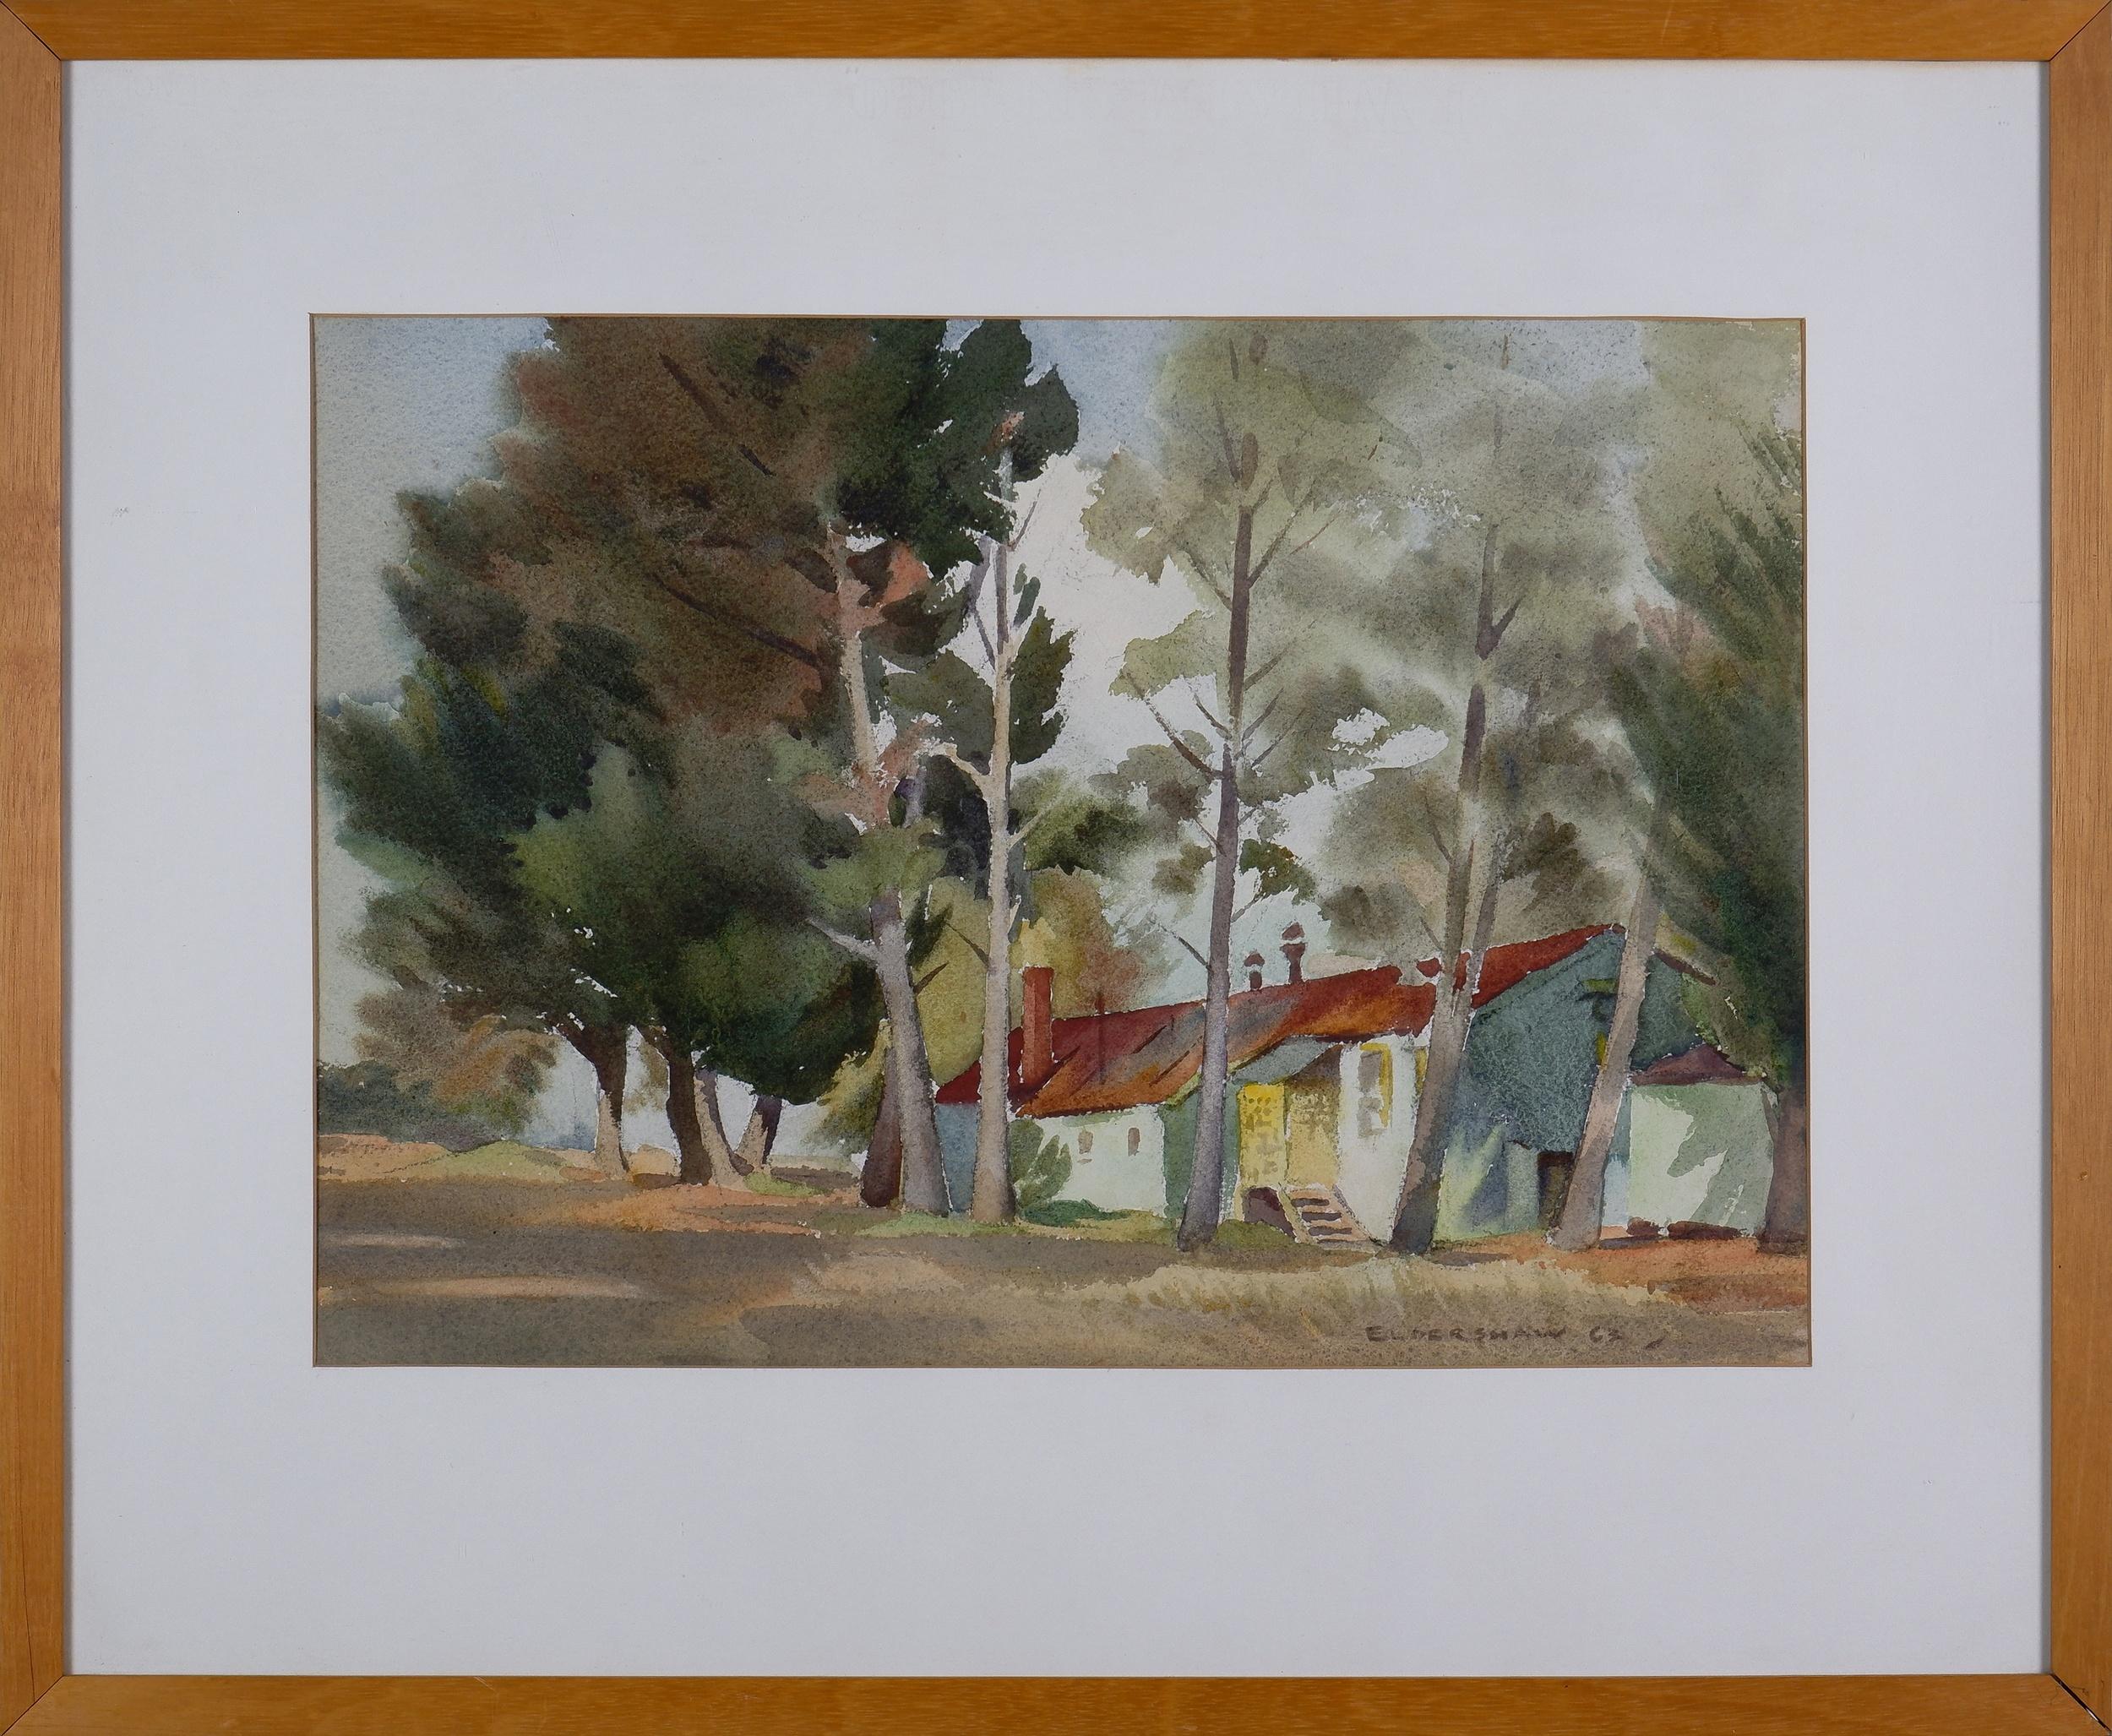 'John Eldershaw (1892-1973), Trades Hall, Acton 1963, Watercolour'